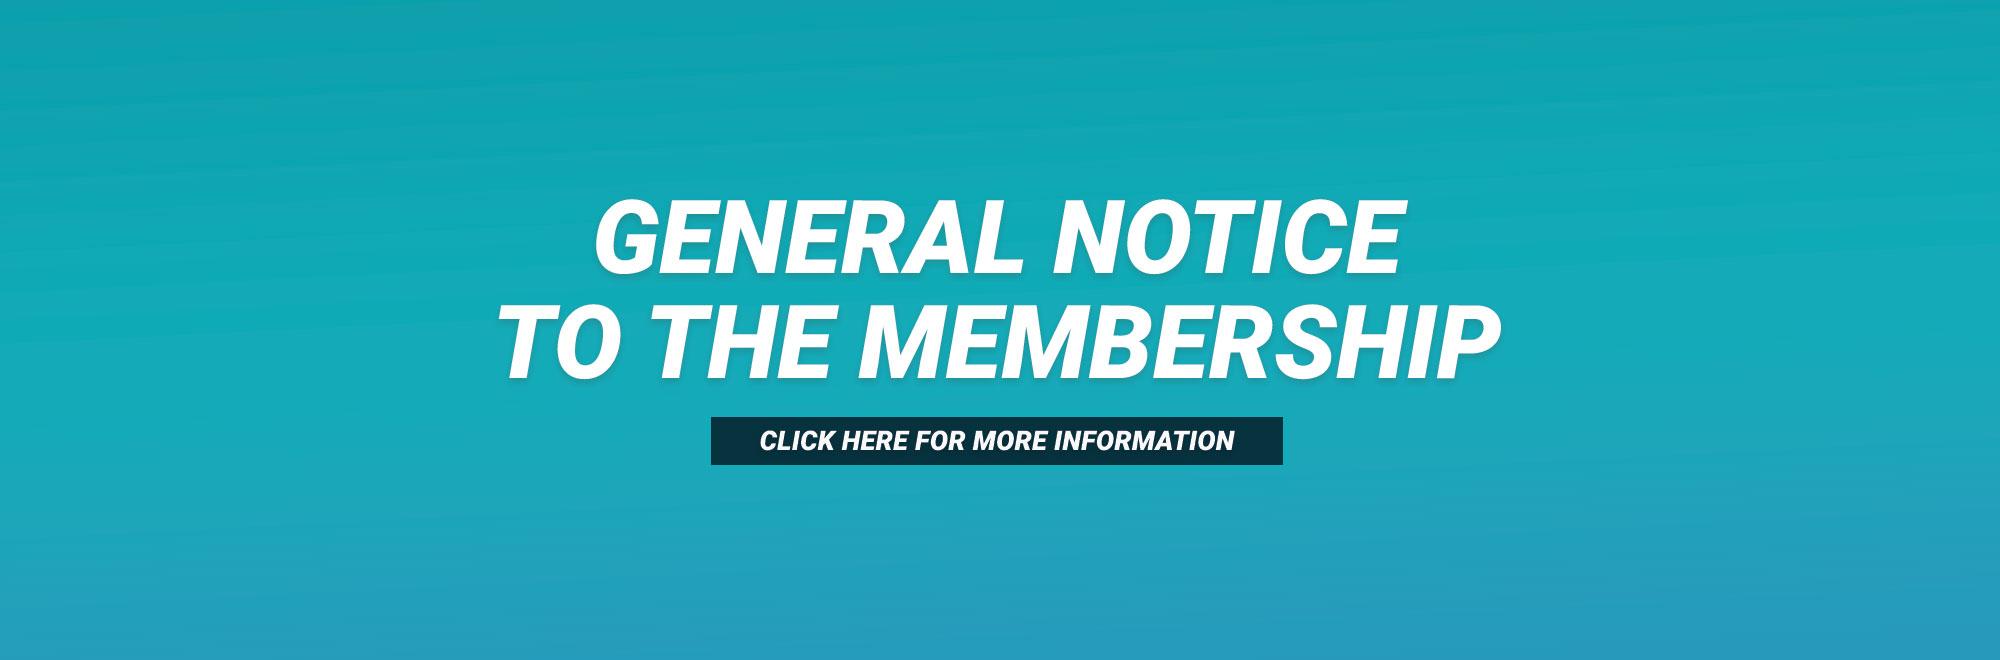 General Notice Banner